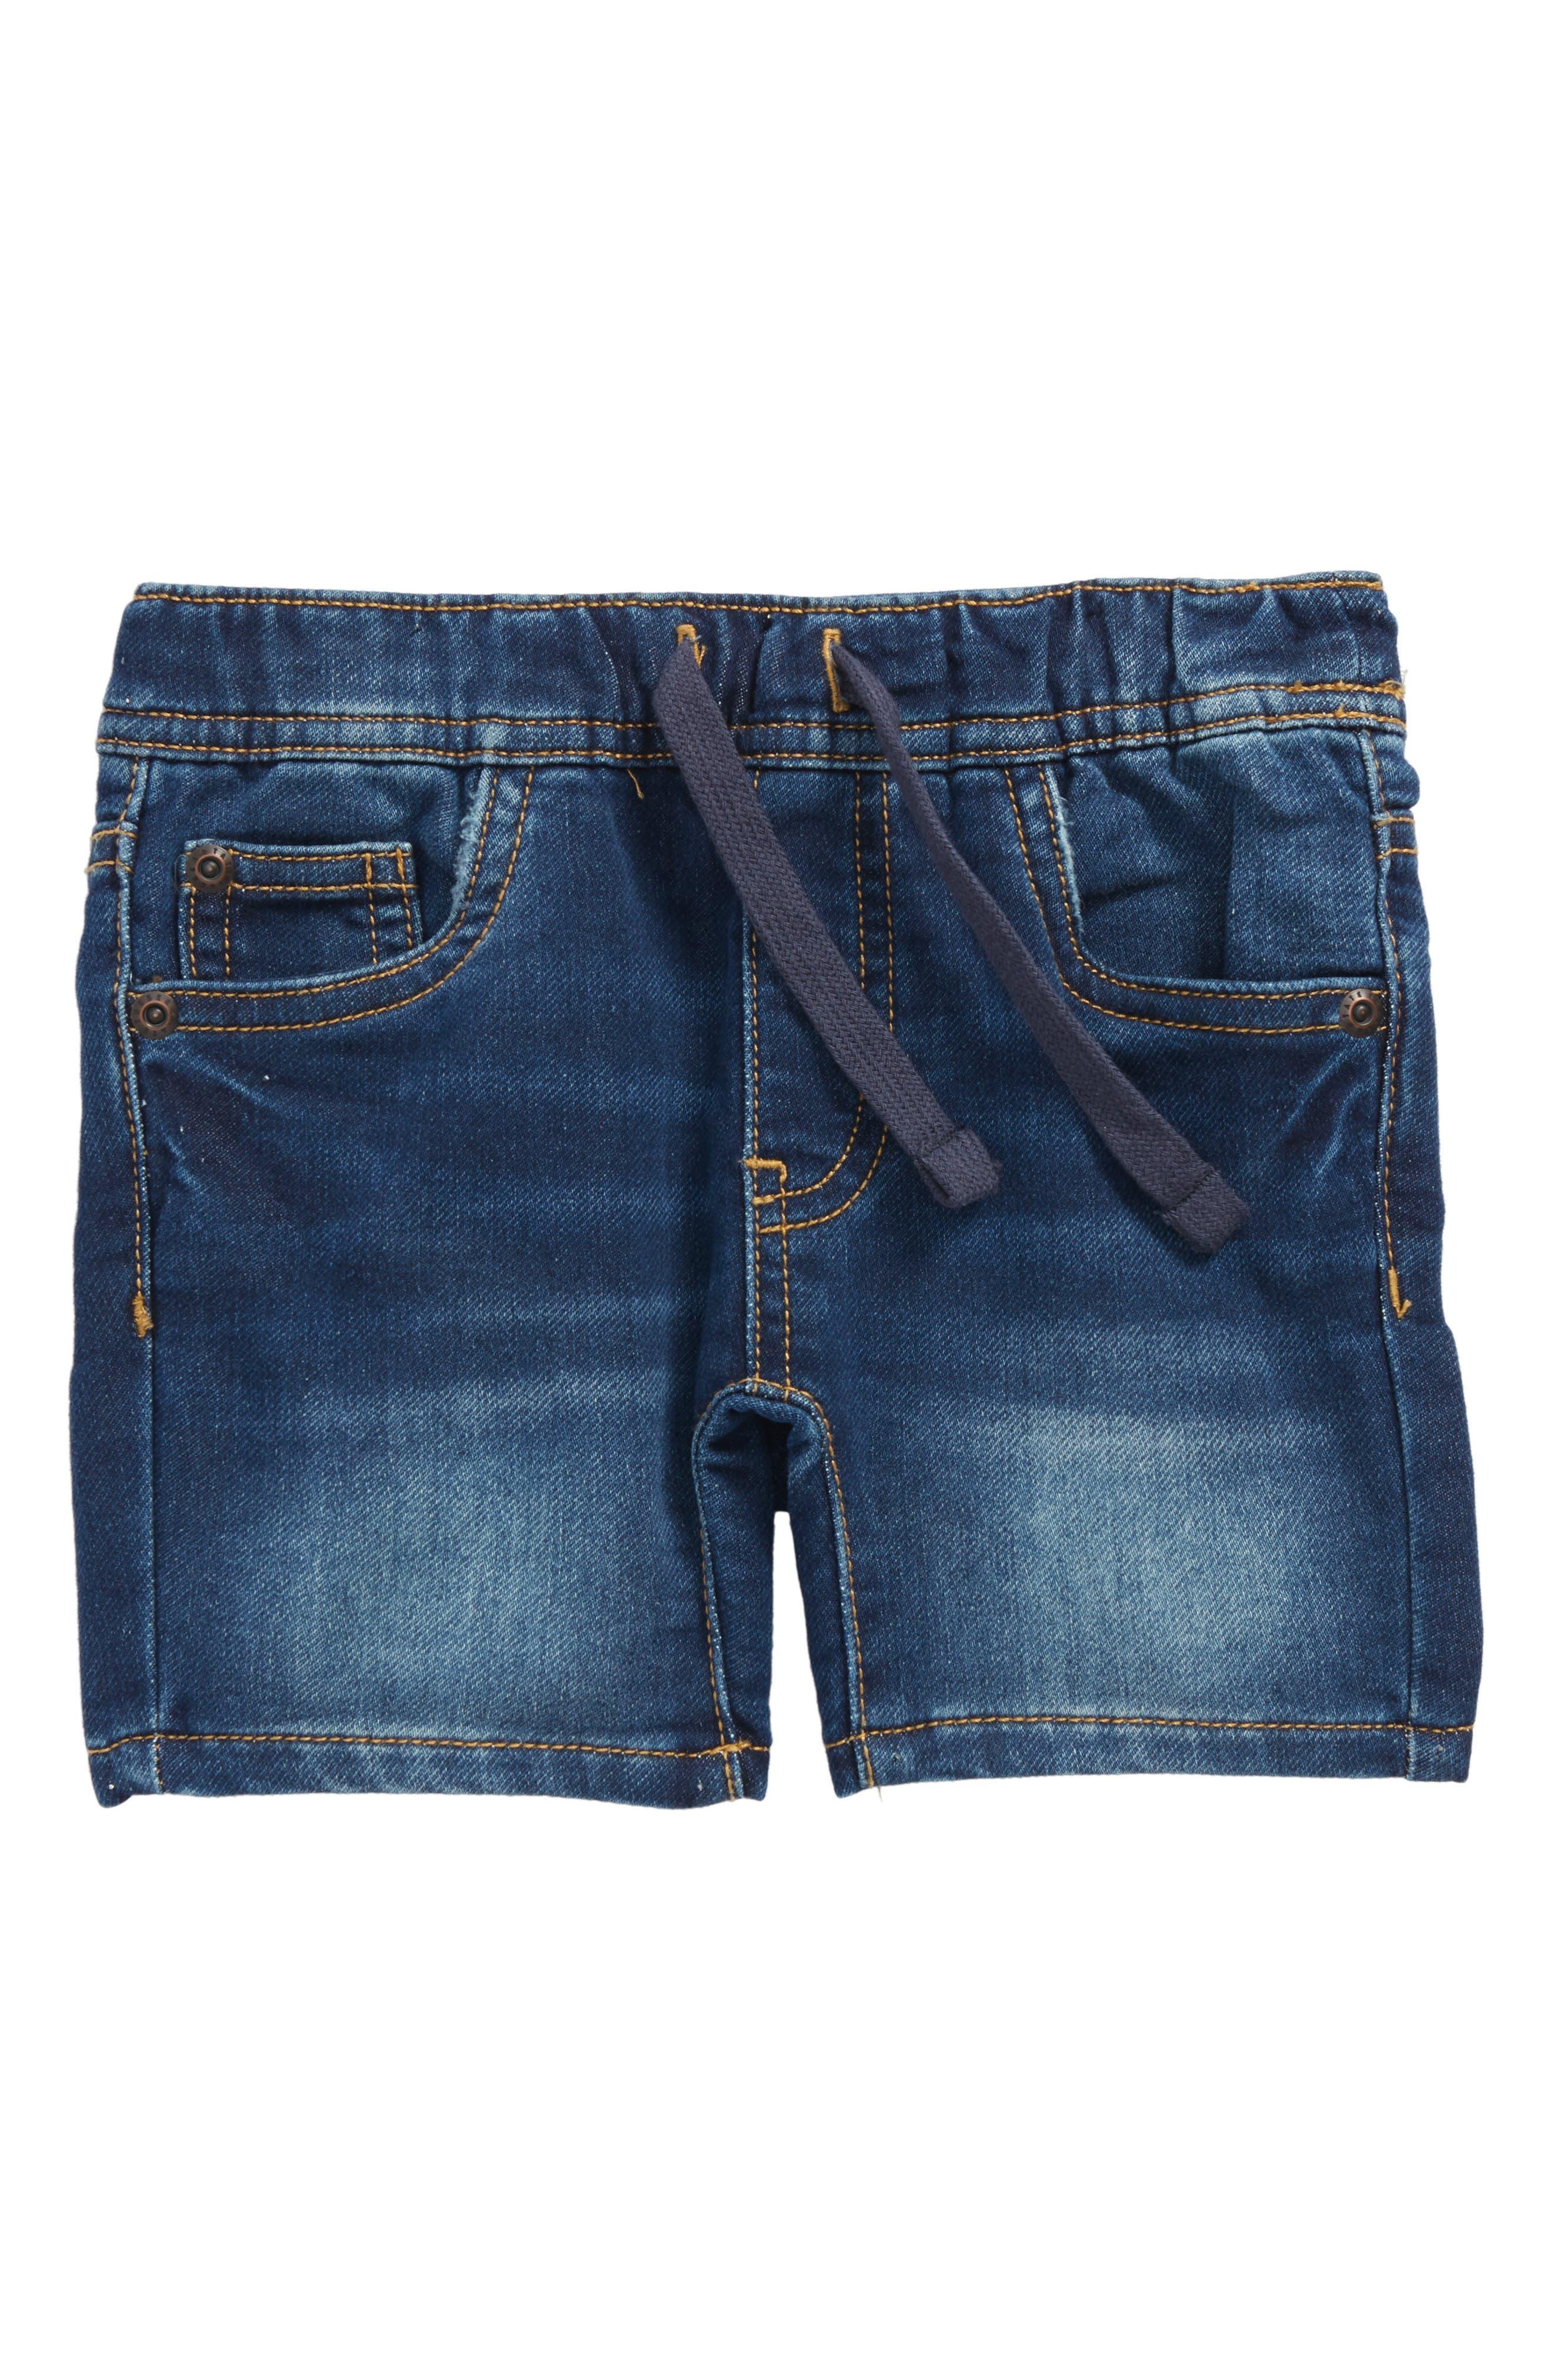 Denim Shorts,                             Main thumbnail 1, color,                             Bale Wash